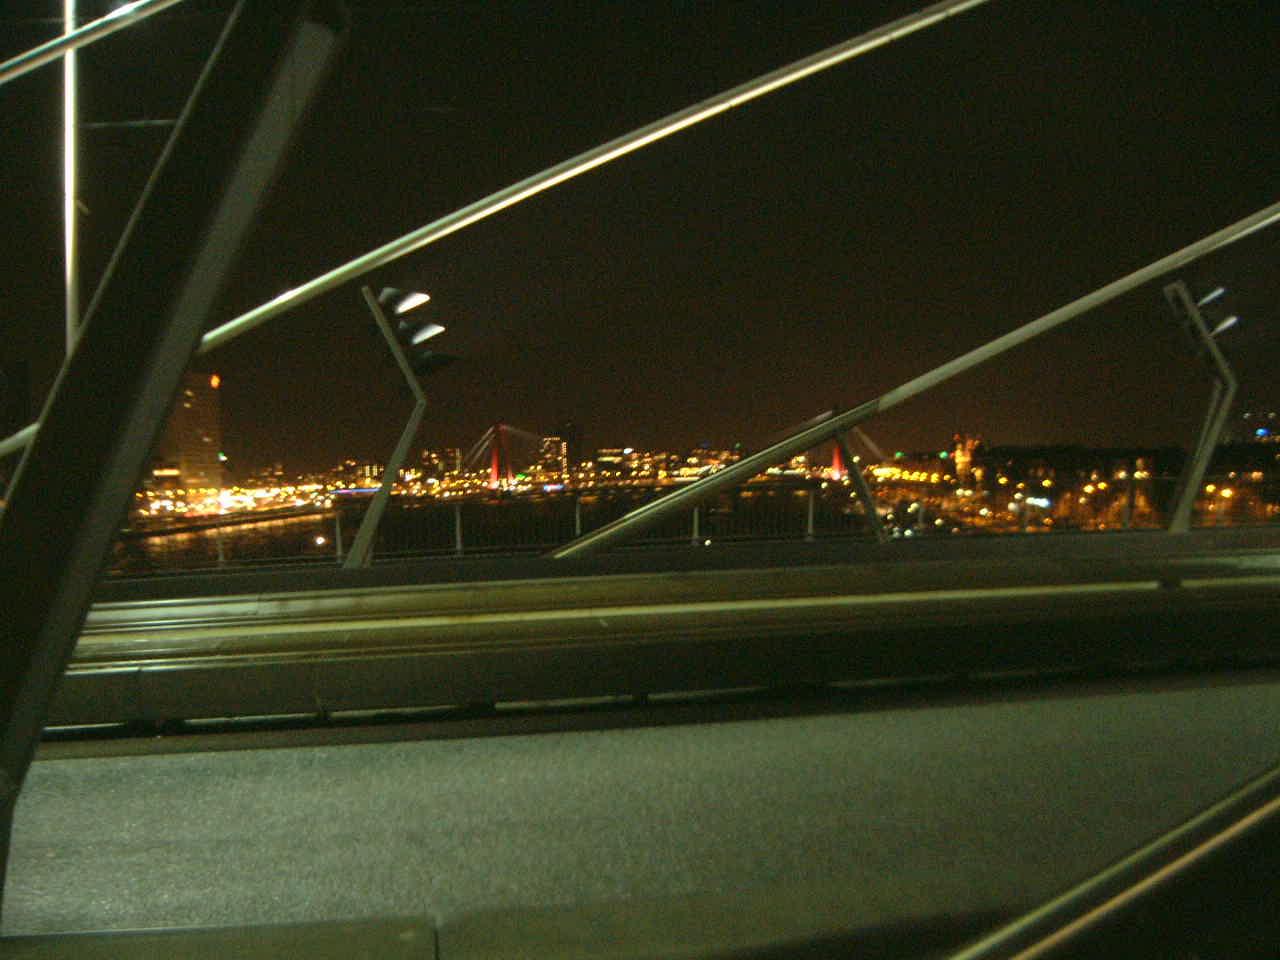 maartent bridge rotterdam zwaan nighttime night time dark car road driving skyline city royalty-free